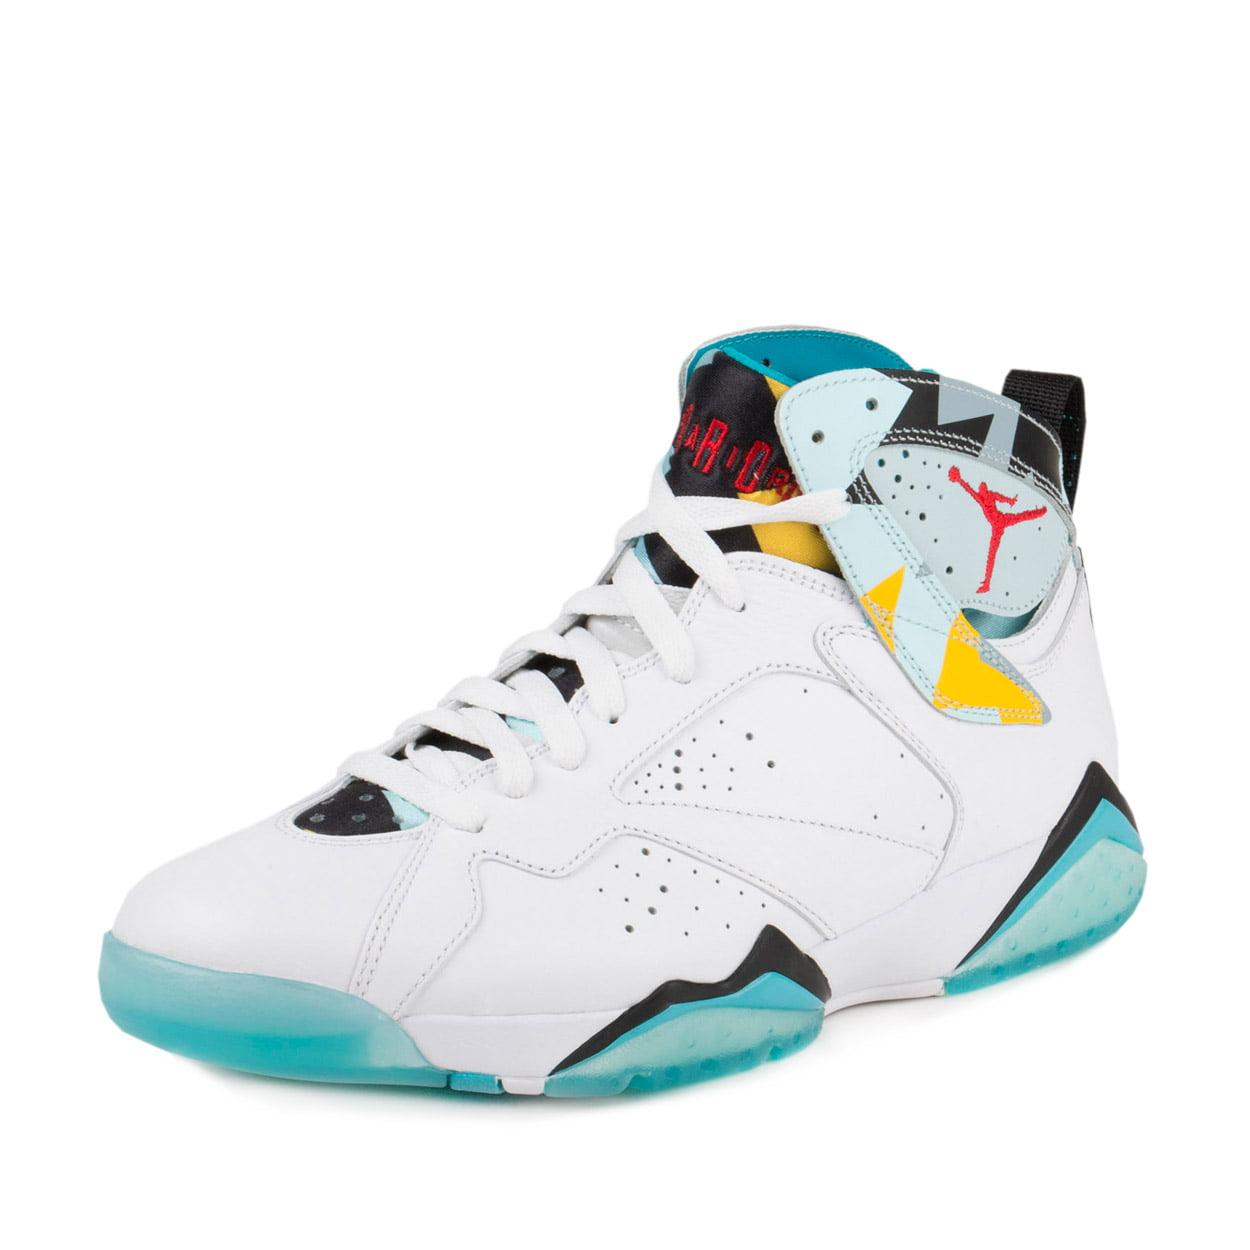 Nike Mens Air Jordan 7 Retro N7 White/Ice Blue-Dark Turqu...